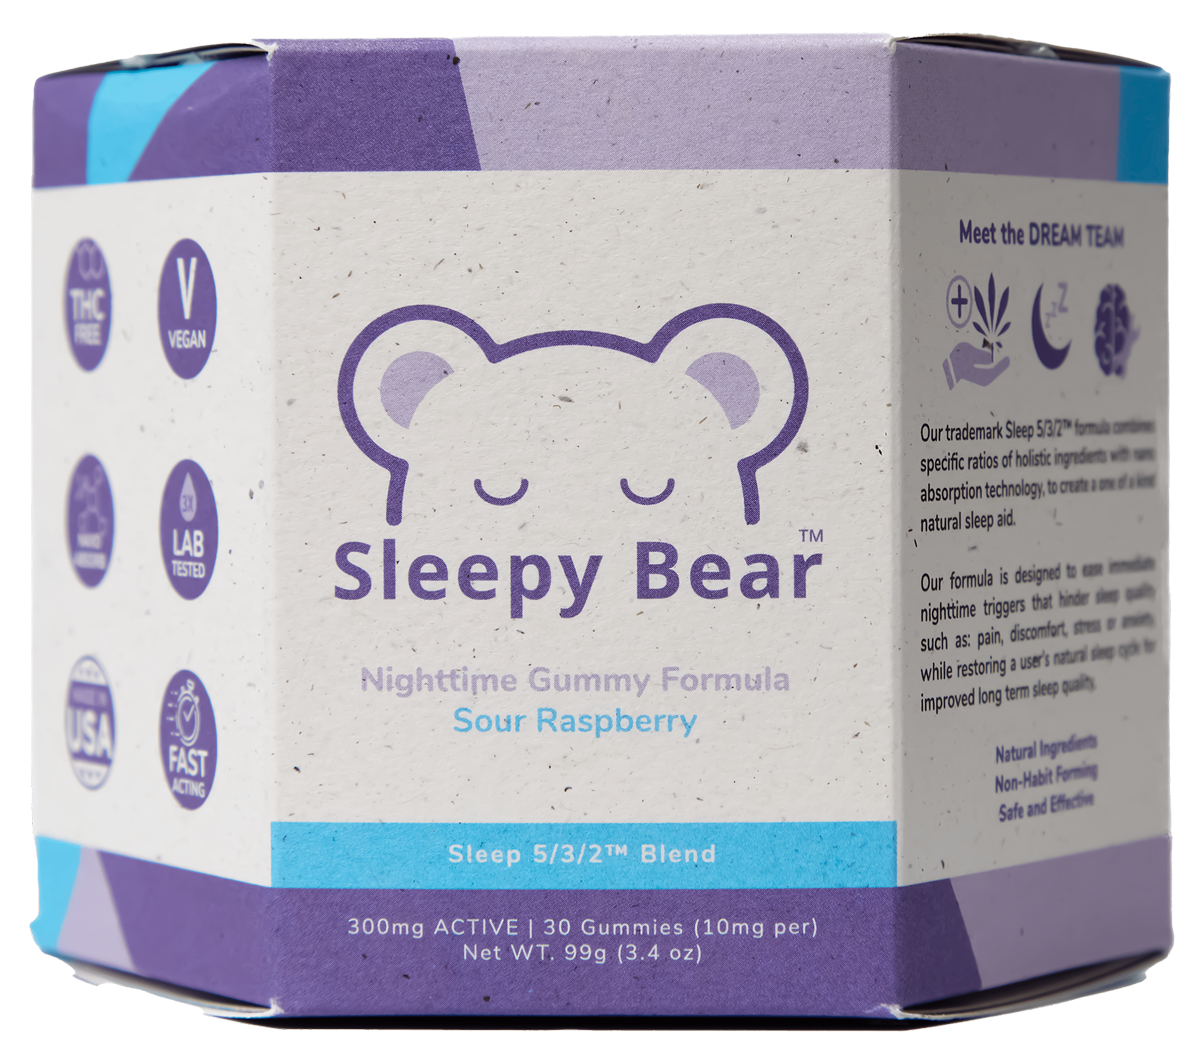 Sleepy Bear CBD CBN Nighttime Gummies 30 count box1